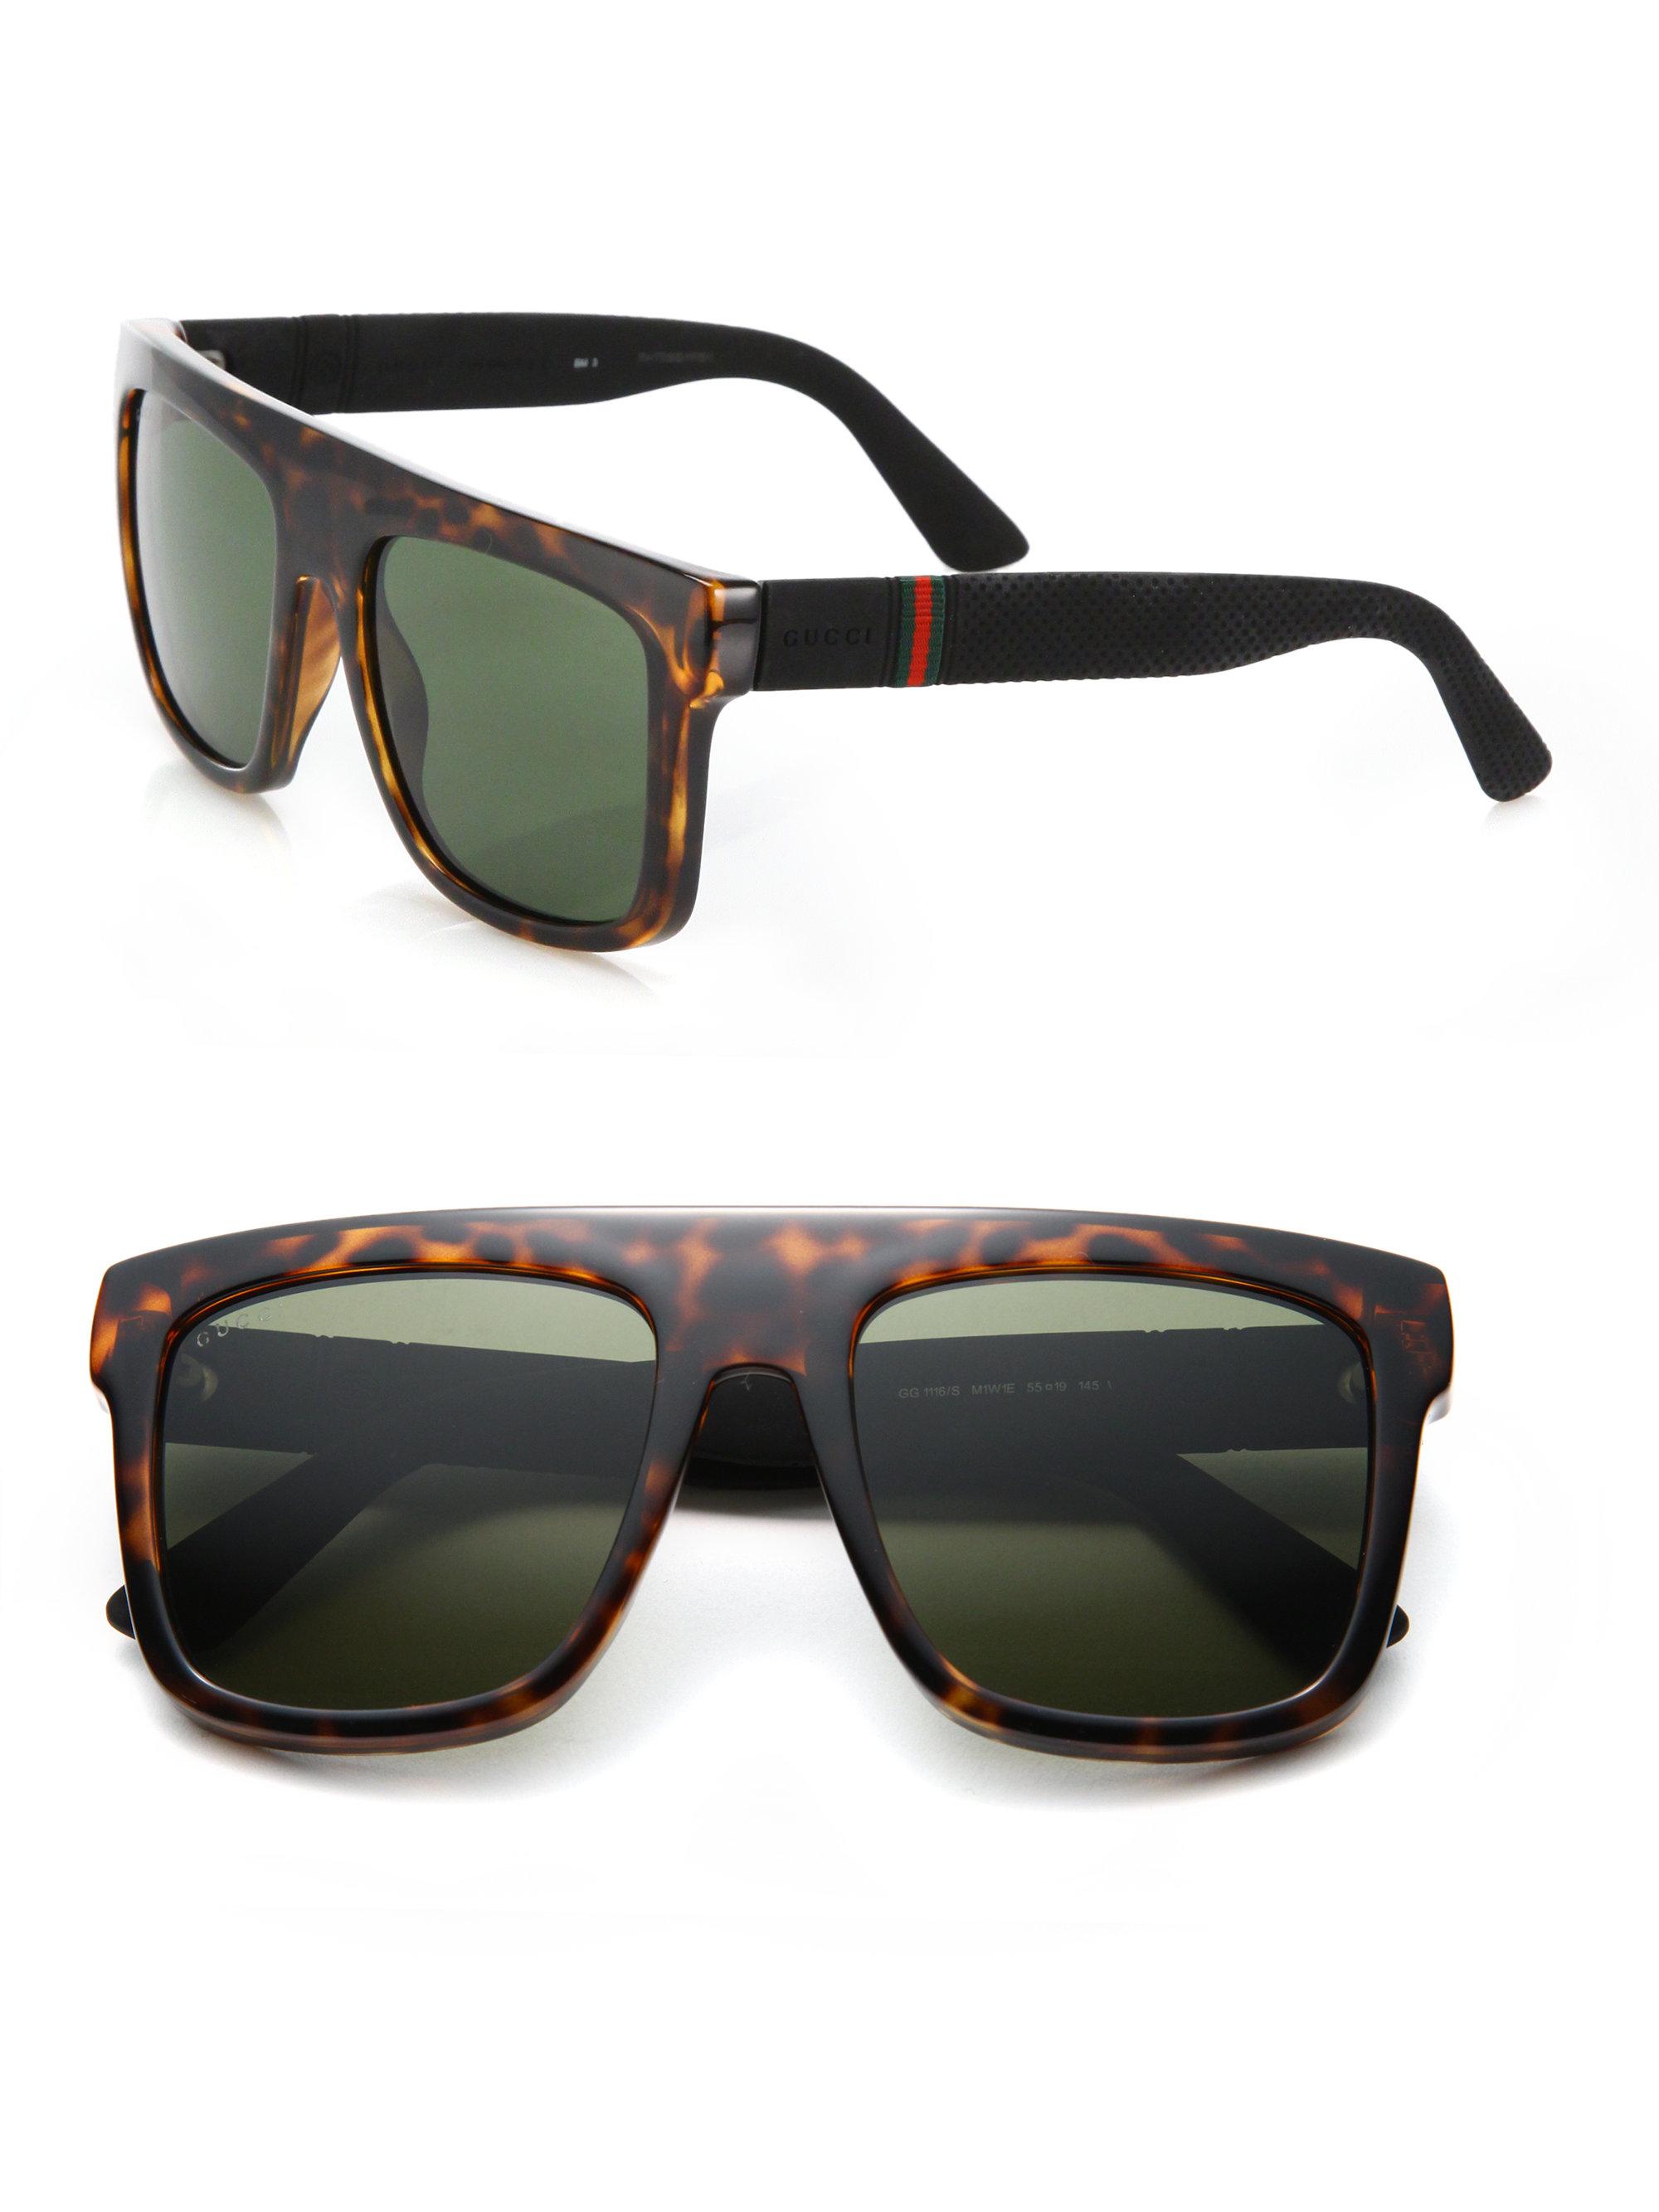 099fbfdc4b9 Lyst - Gucci 55mm Flat-top Injected Sunglasses in Black